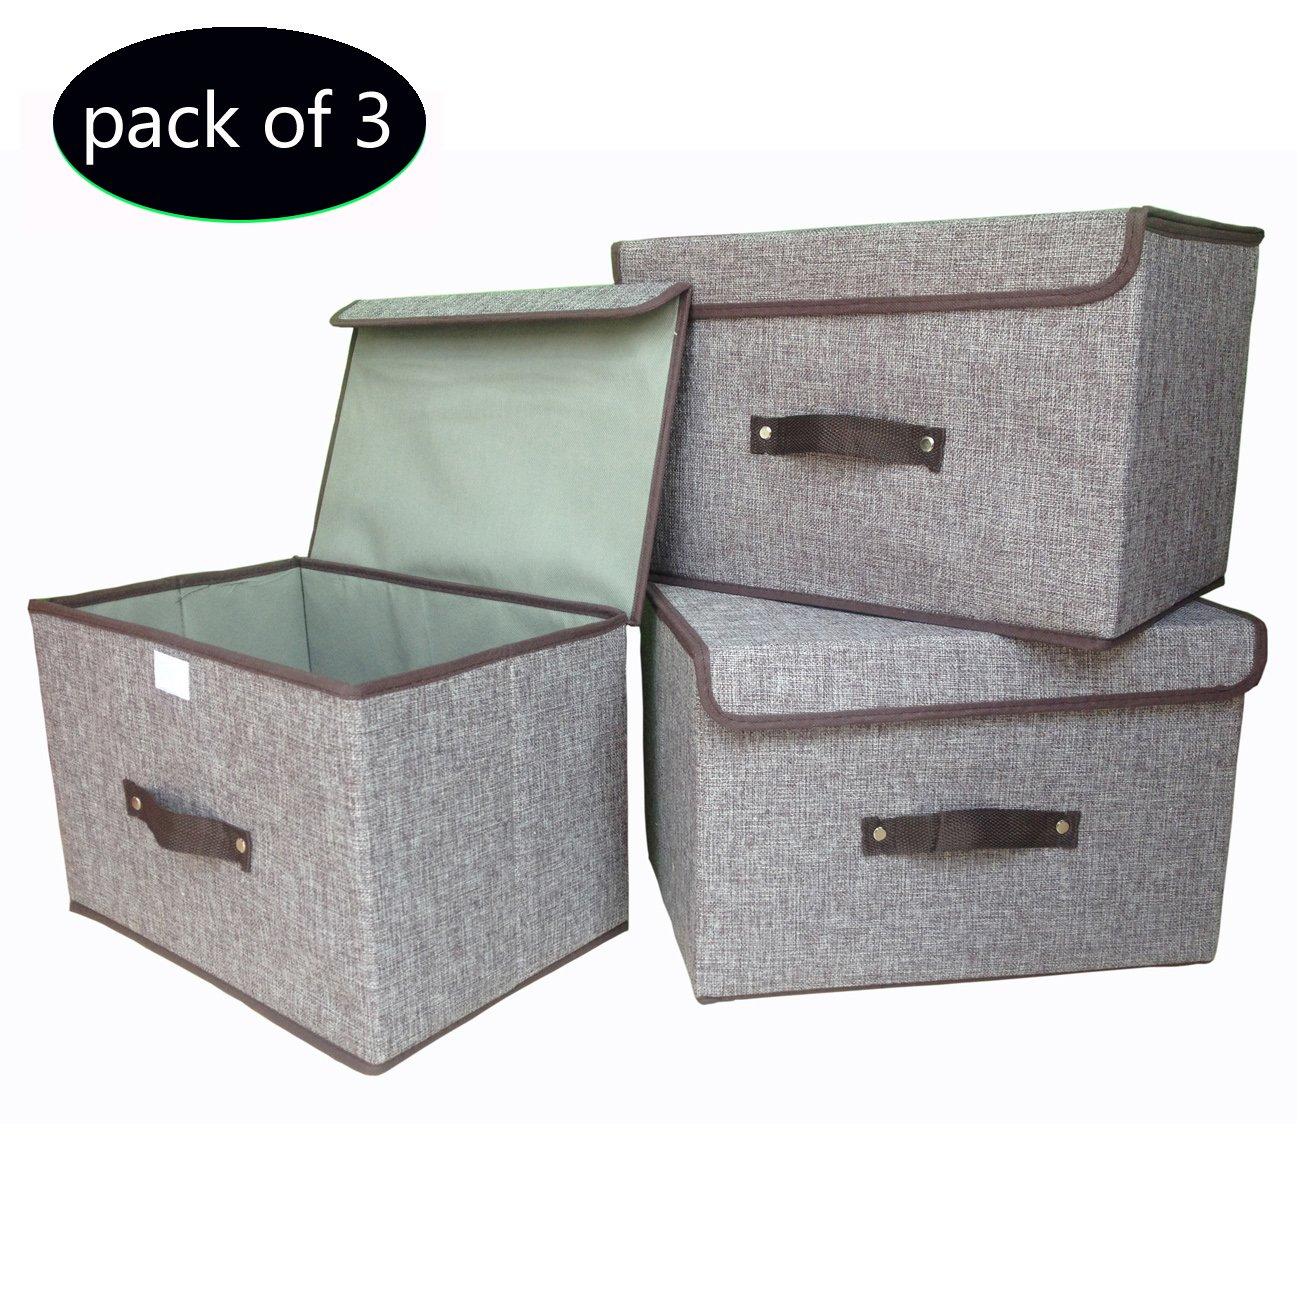 large storage boxes 3 pack ezoware large linen fabric foldable storage cubes bin. Black Bedroom Furniture Sets. Home Design Ideas